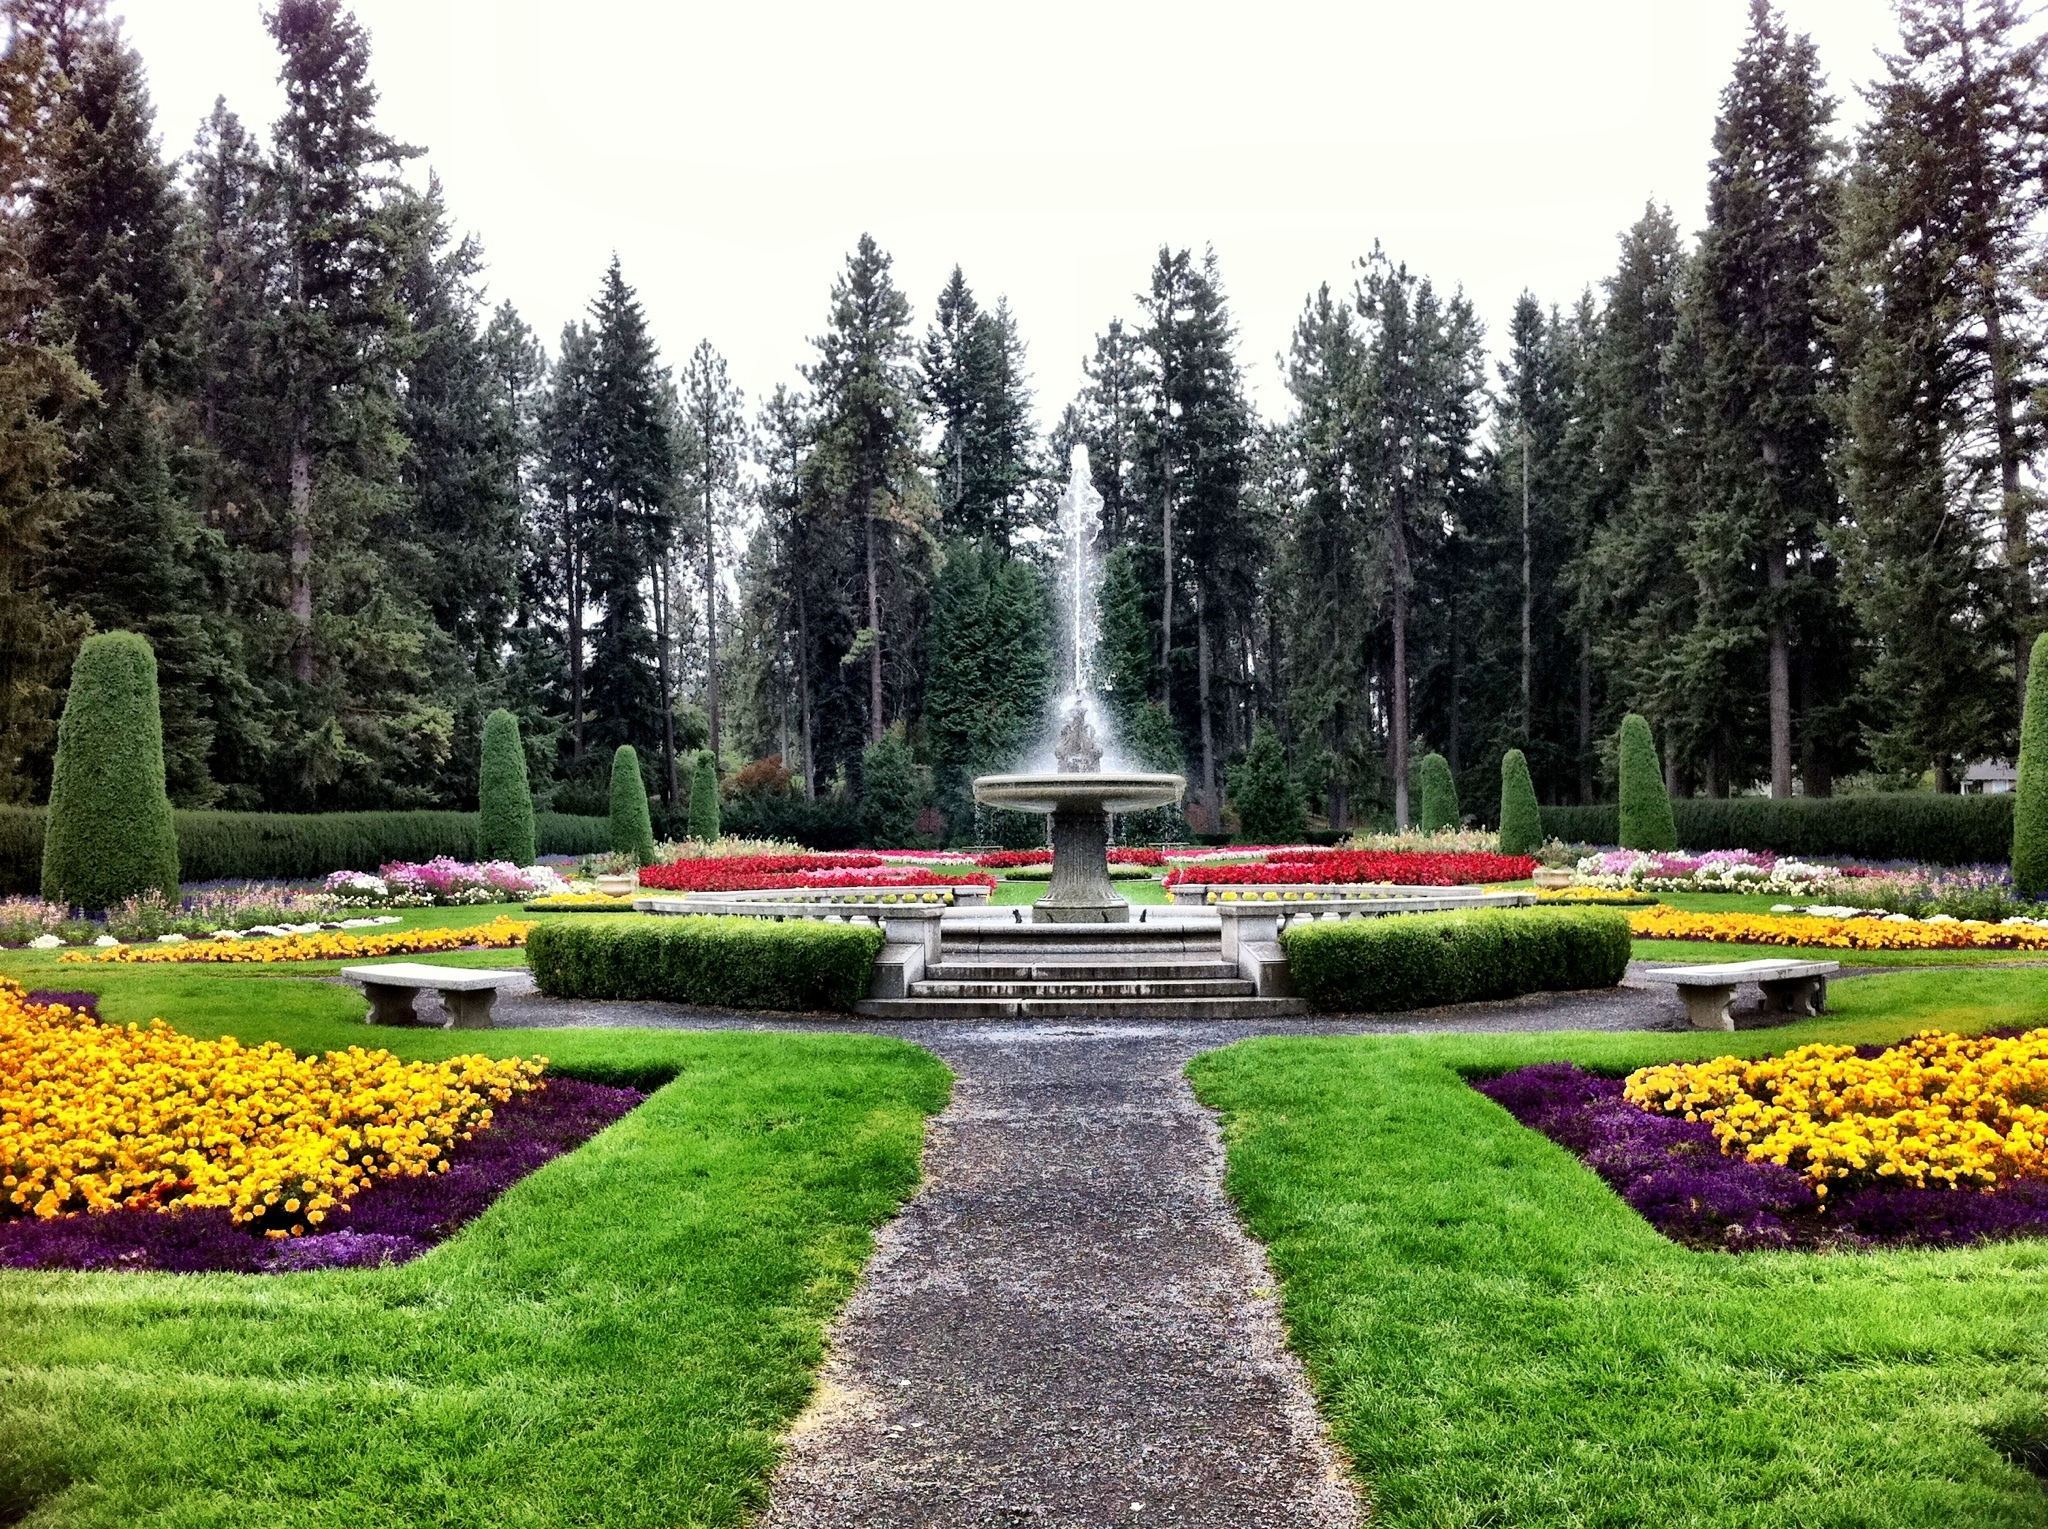 davenport-fountain-in-duncan-gardens-copy